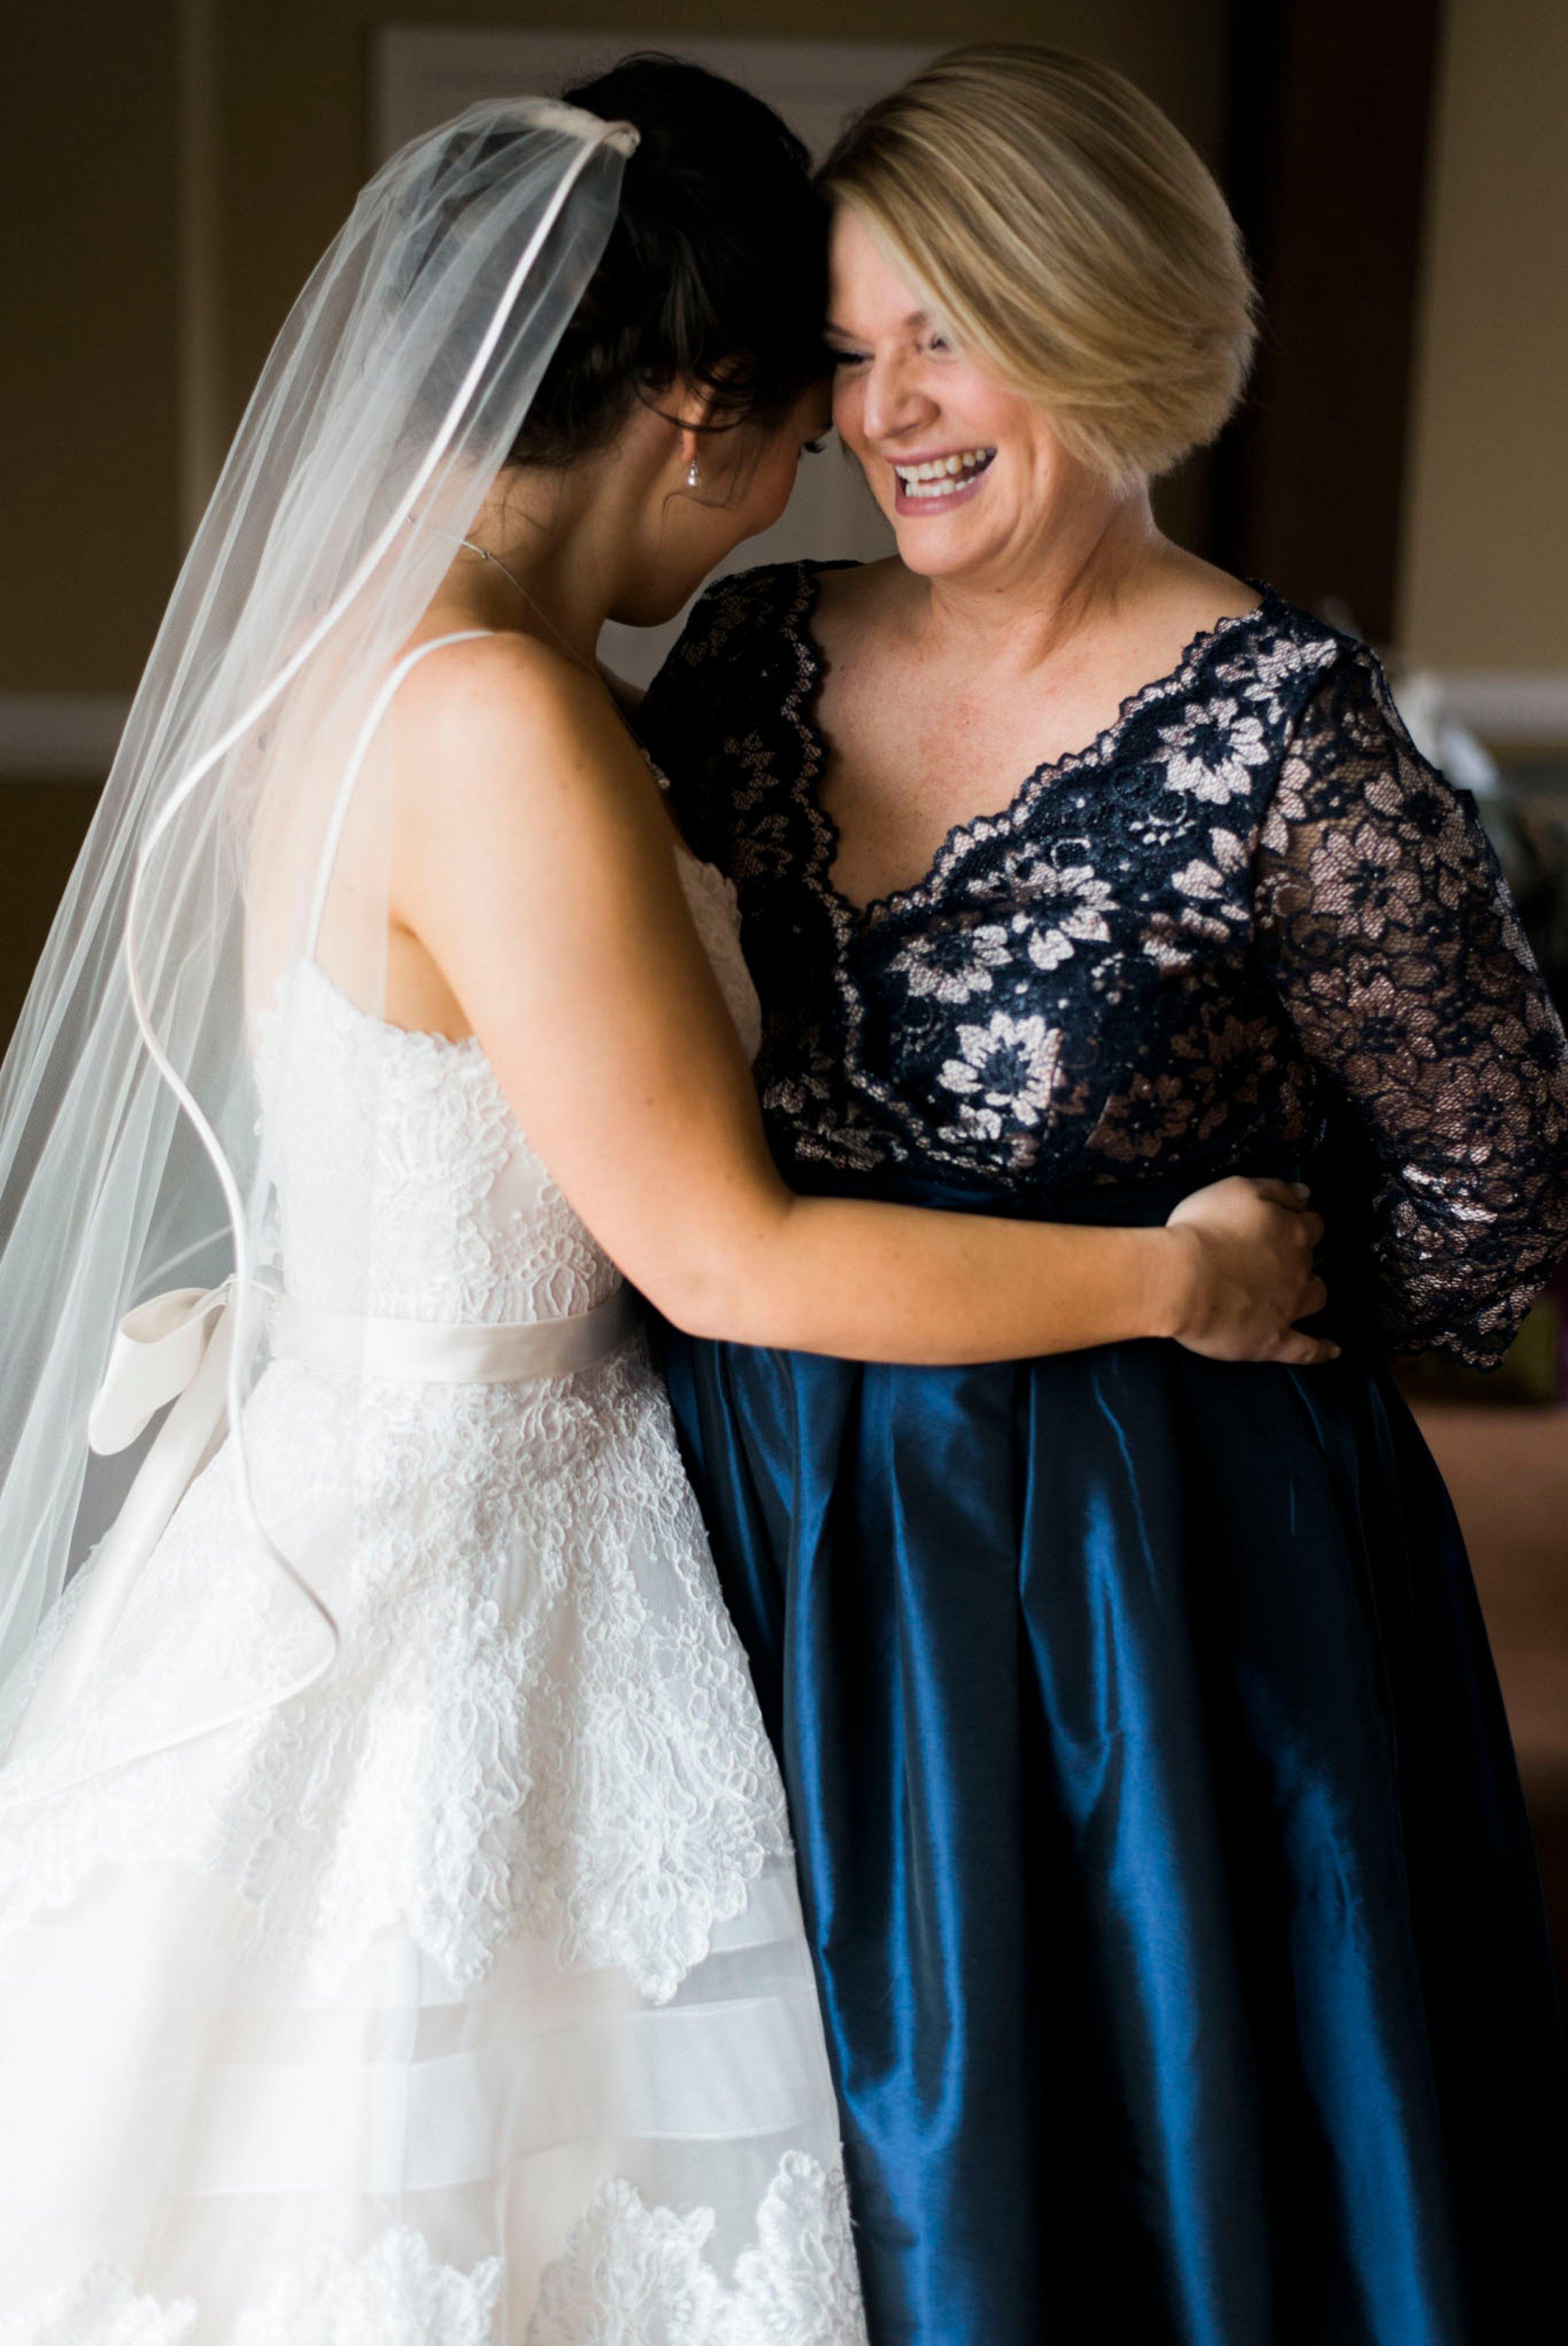 IrvineEstate_LexingtonVA_Wedding_FallWedding_VirginiaWeddingPhotographer 18.jpg